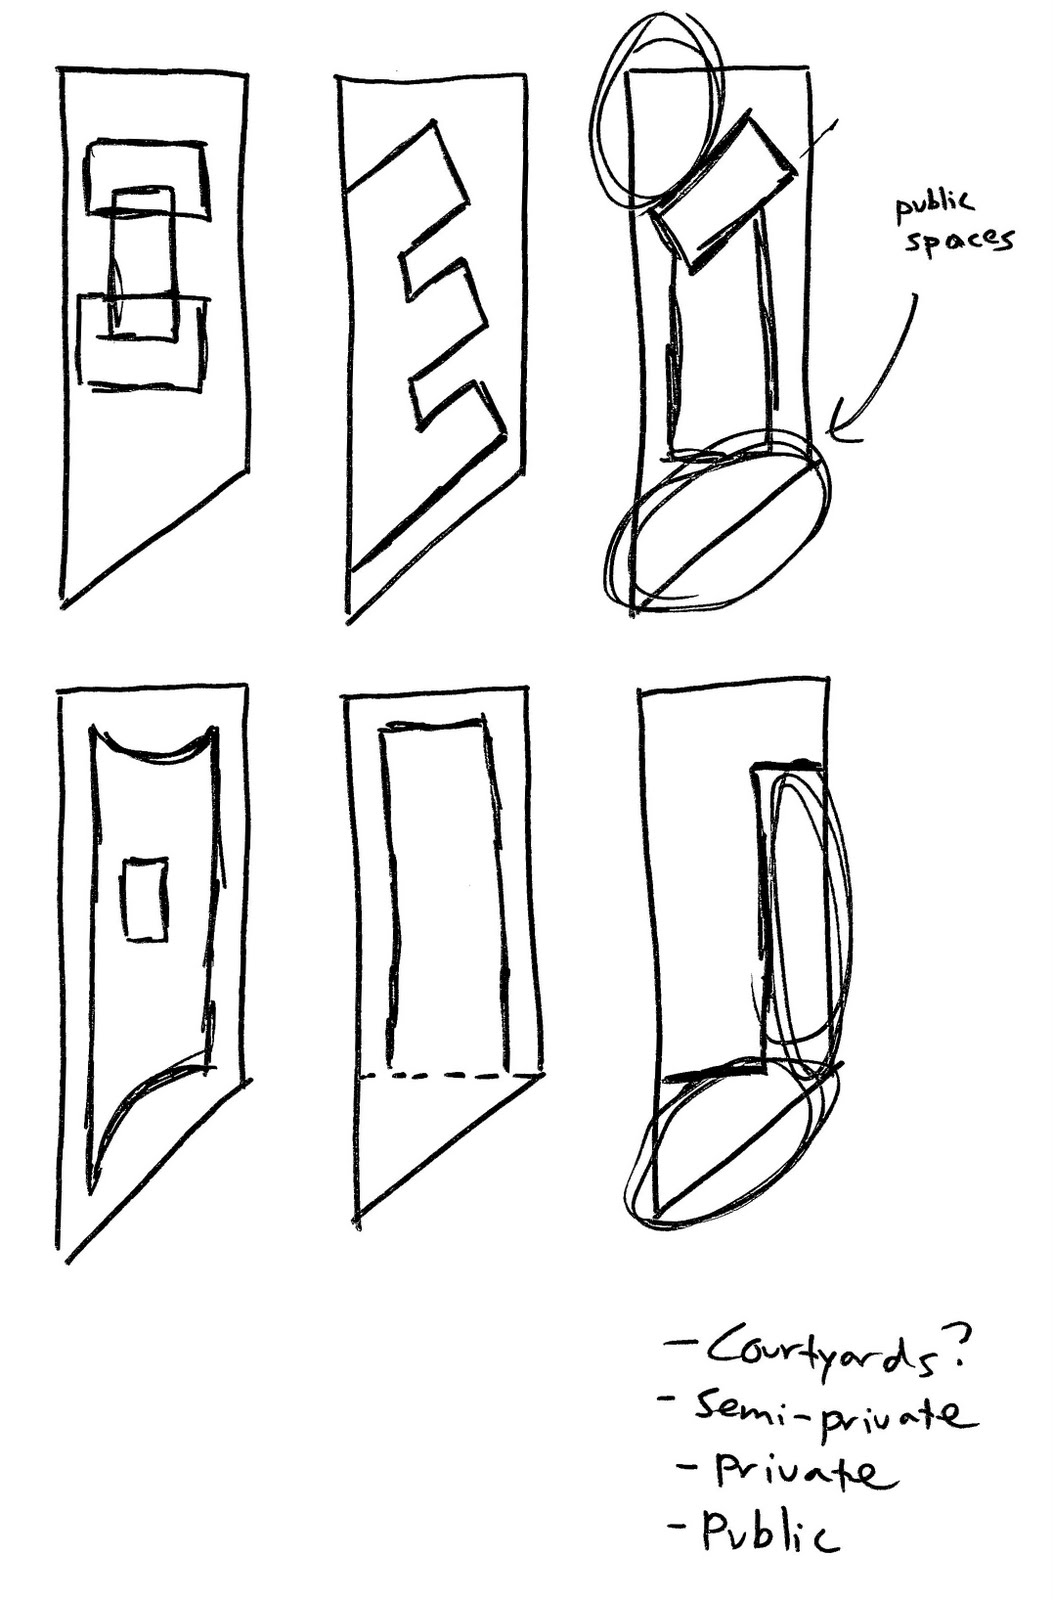 vanessa yu  arch1201 project 3  parti diagrams